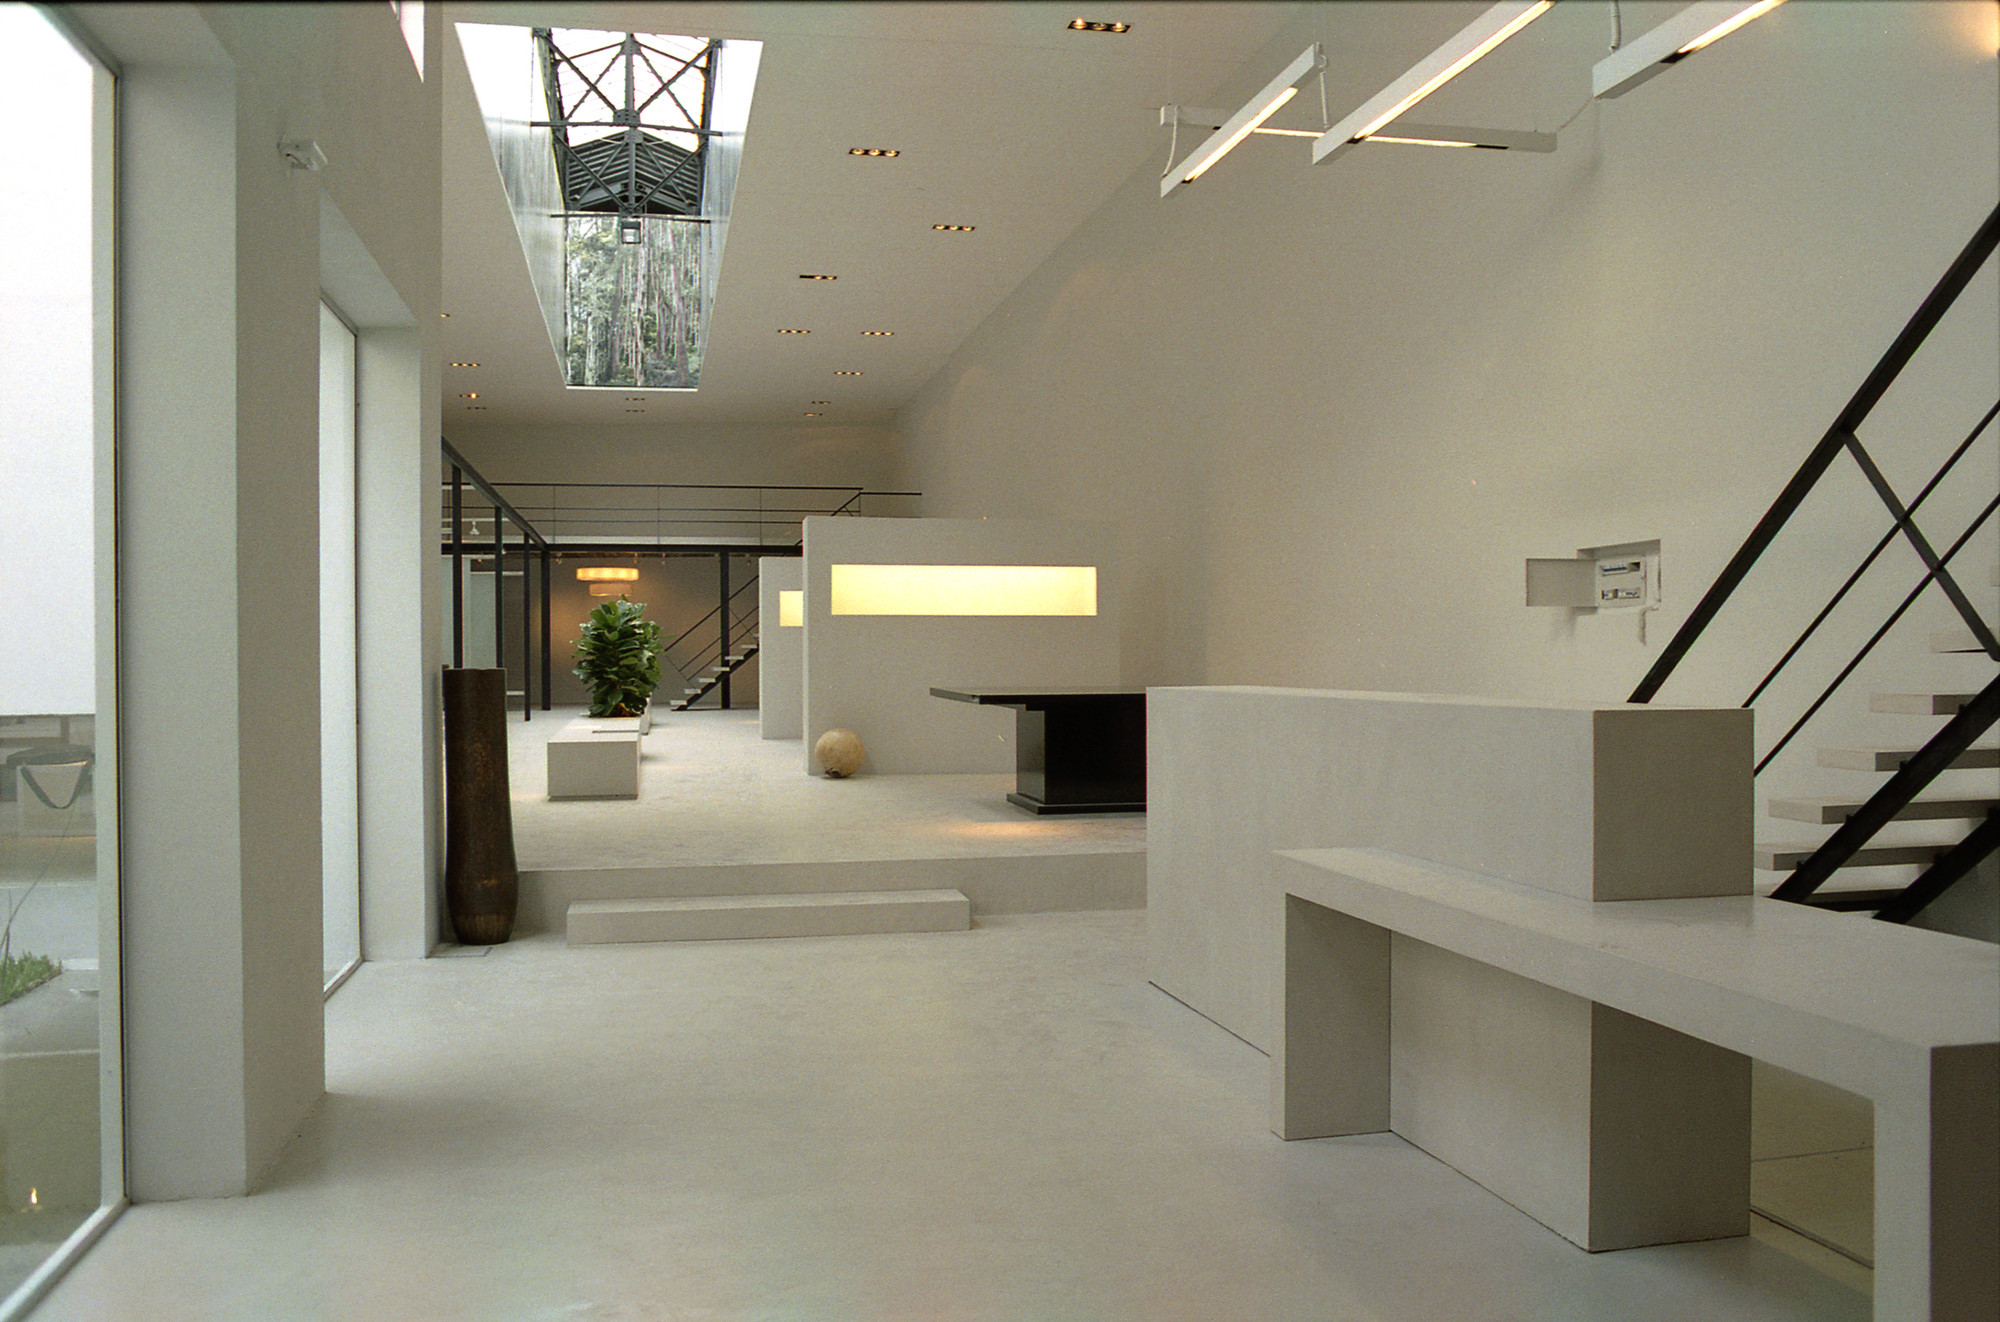 Tienda SIMPLE / vEstudio Arquitectura, © Anabella Goldberger